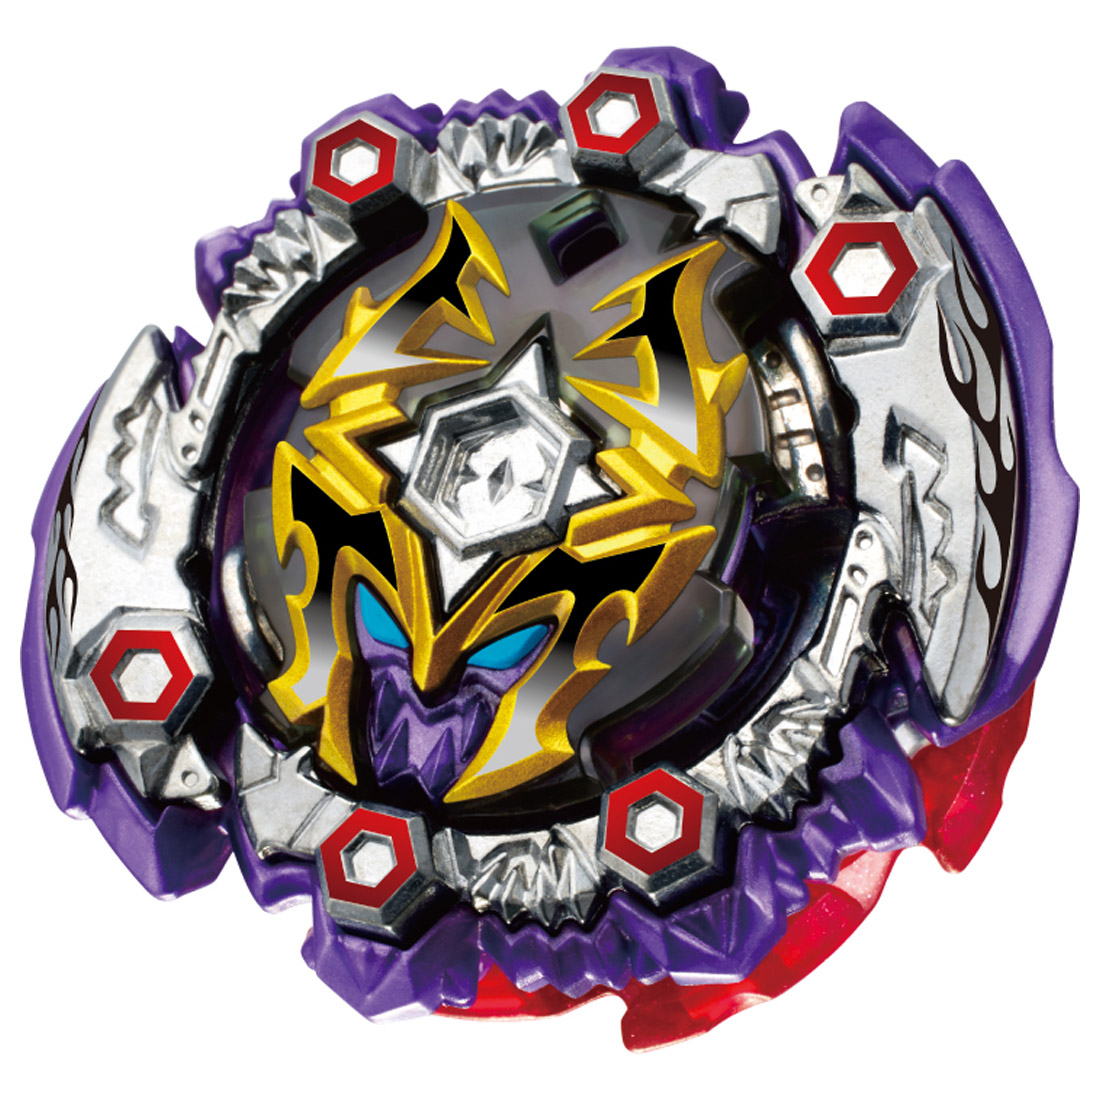 savagemax's avatar